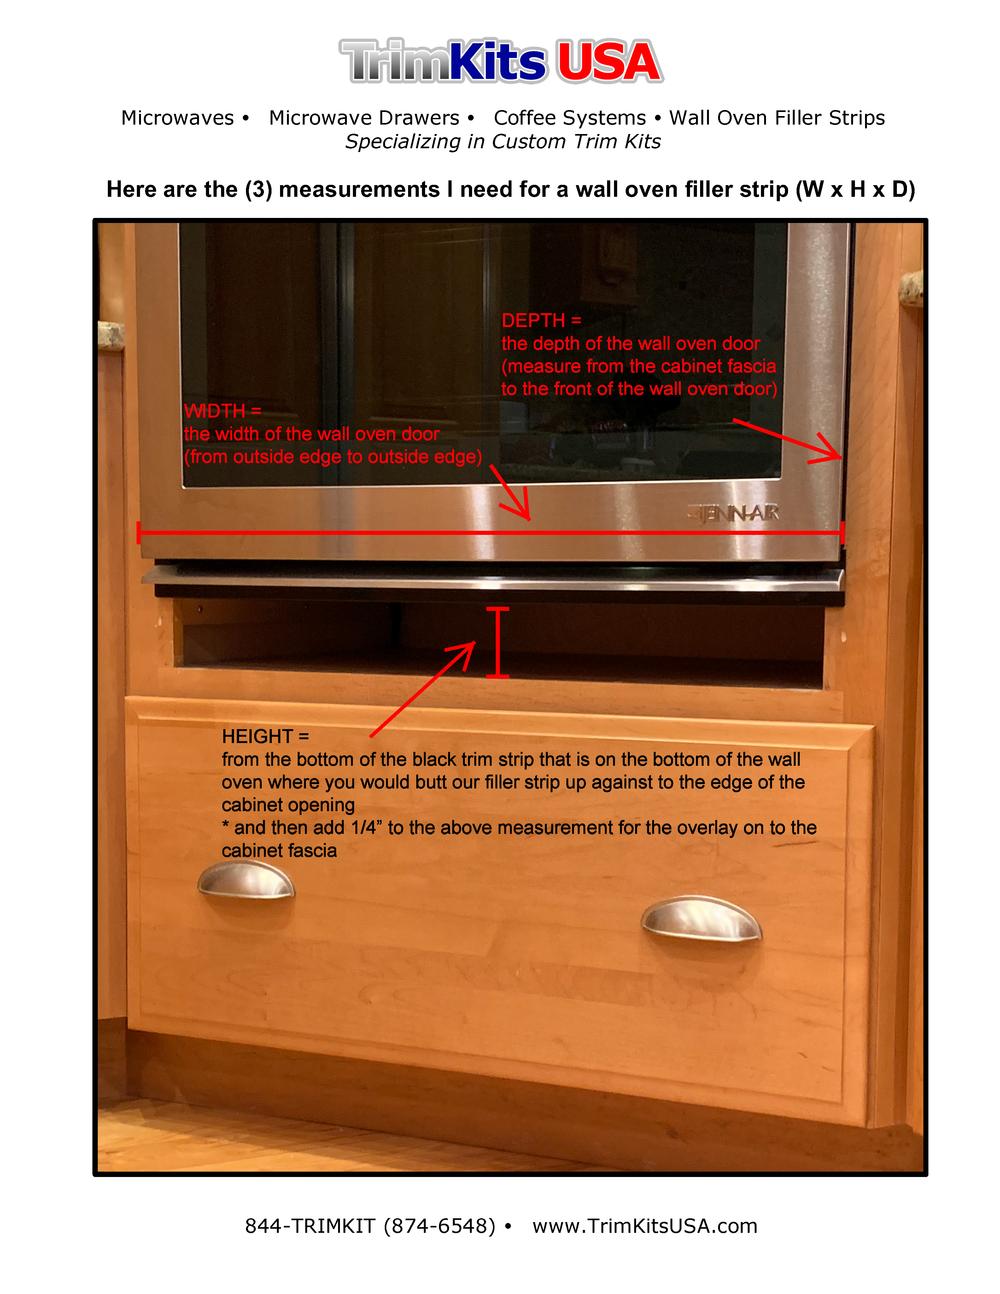 TKUSA Wall Oven Filler Strip Measurements on Letterhead.png